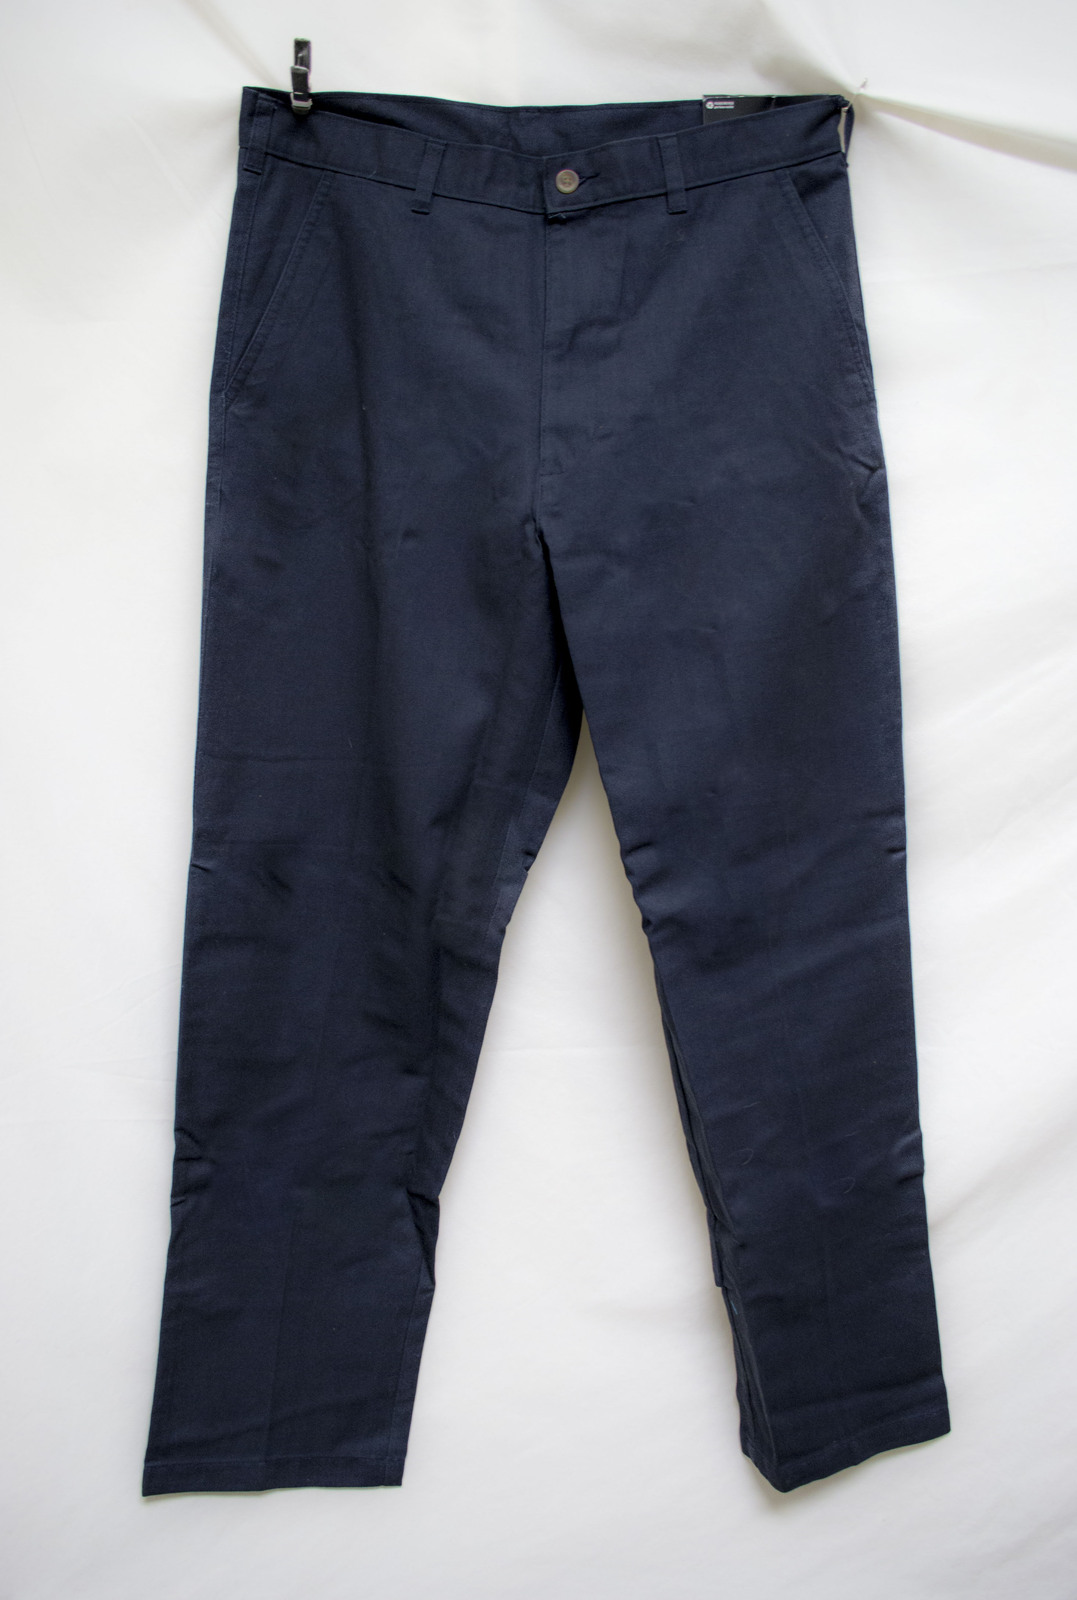 Free Ship 2 Lot of 2 Men's 34'' x 32'' Jeans Men's Plaint Dress Pants Dark Blue